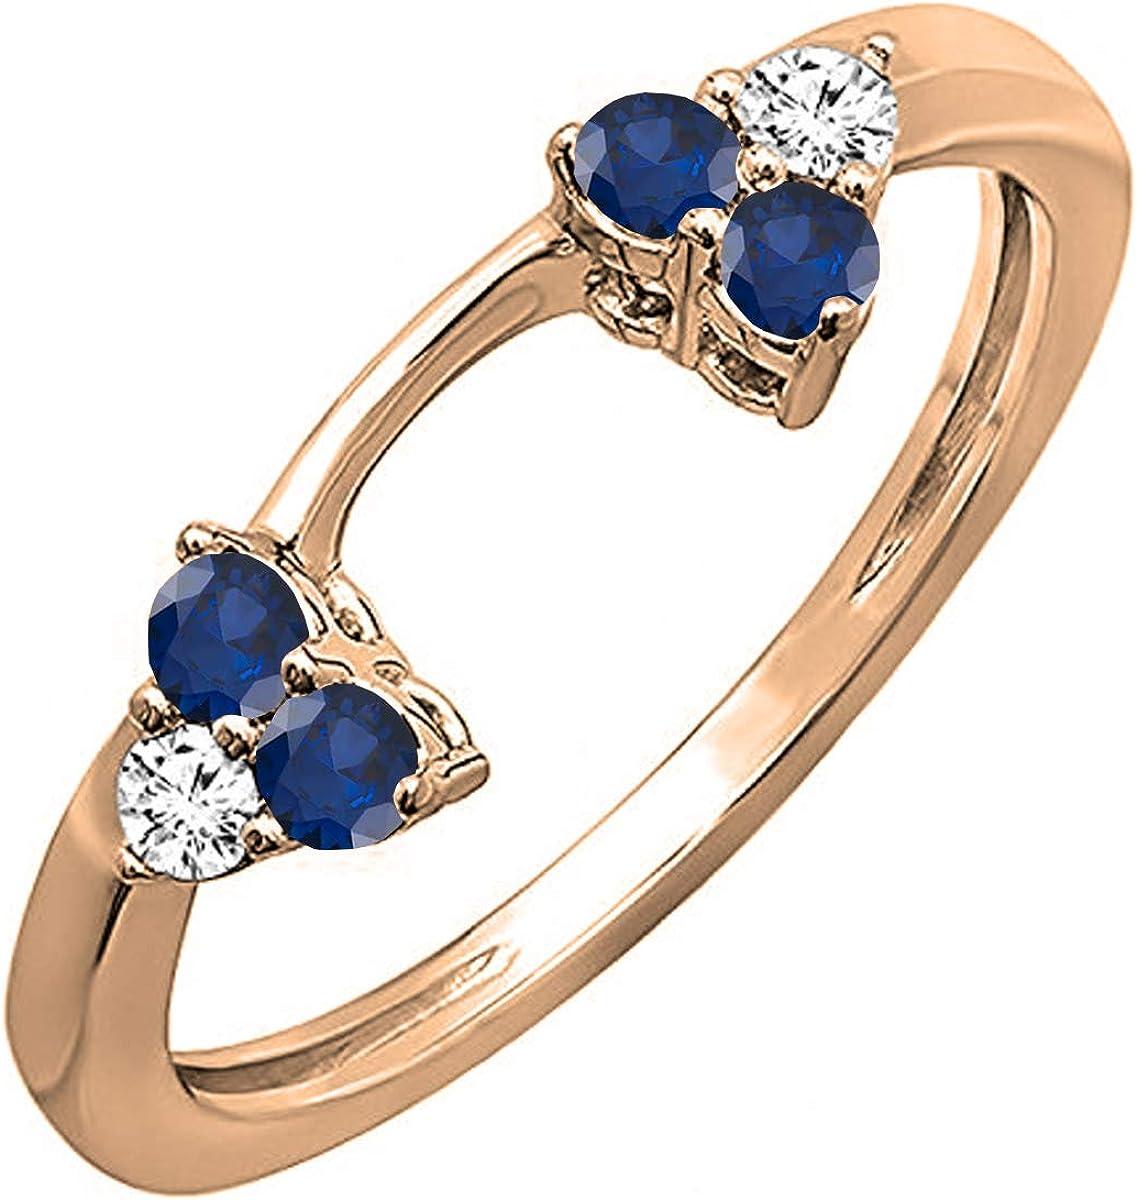 Dazzlingrock Collection 14K Gold Round Blue Sapphire & White Diamond Ladies Wedding Ring Matching Guard Band